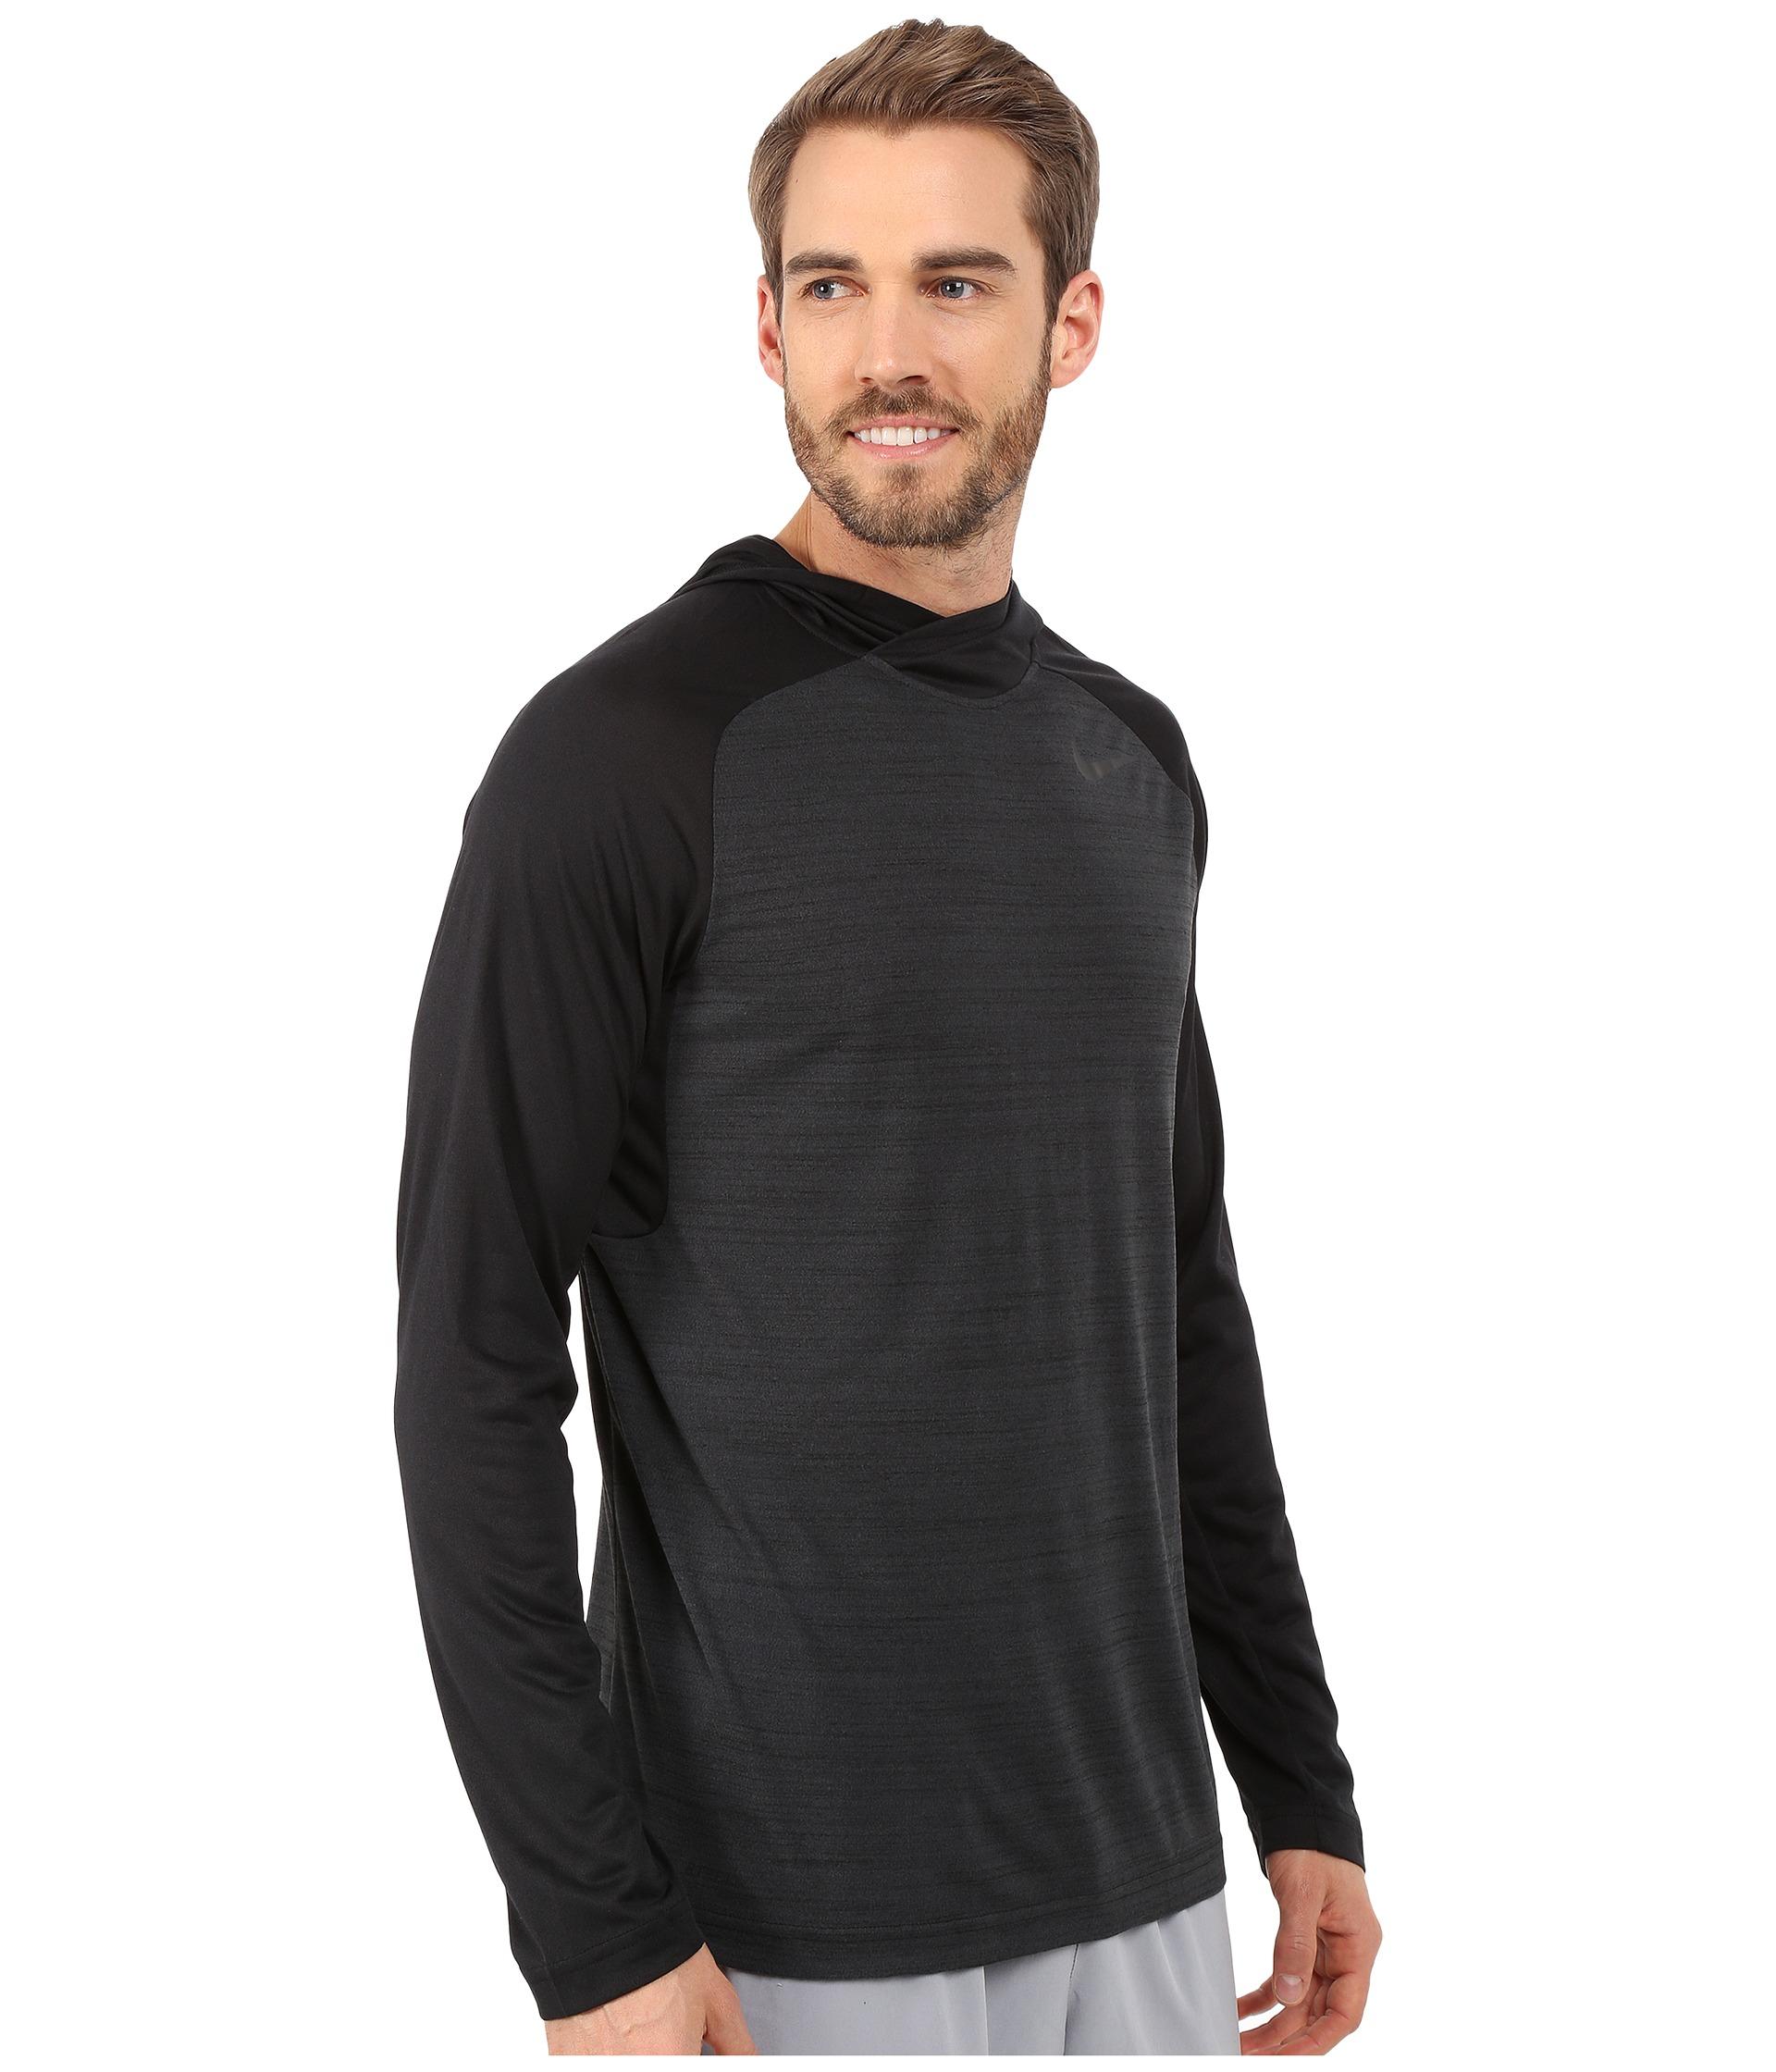 7e483e73 Nike Mens Dri Fit Touch Hooded Long Sleeve Shirt